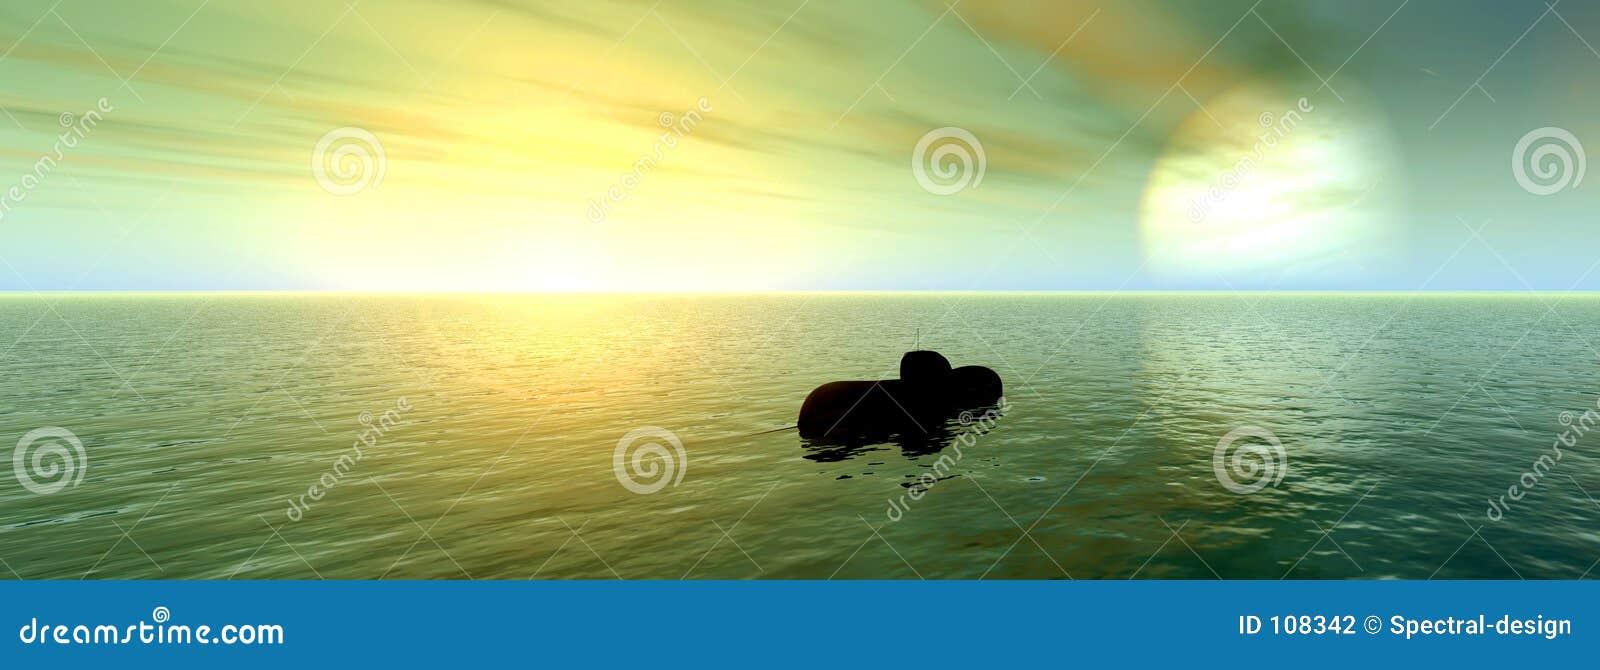 U-887